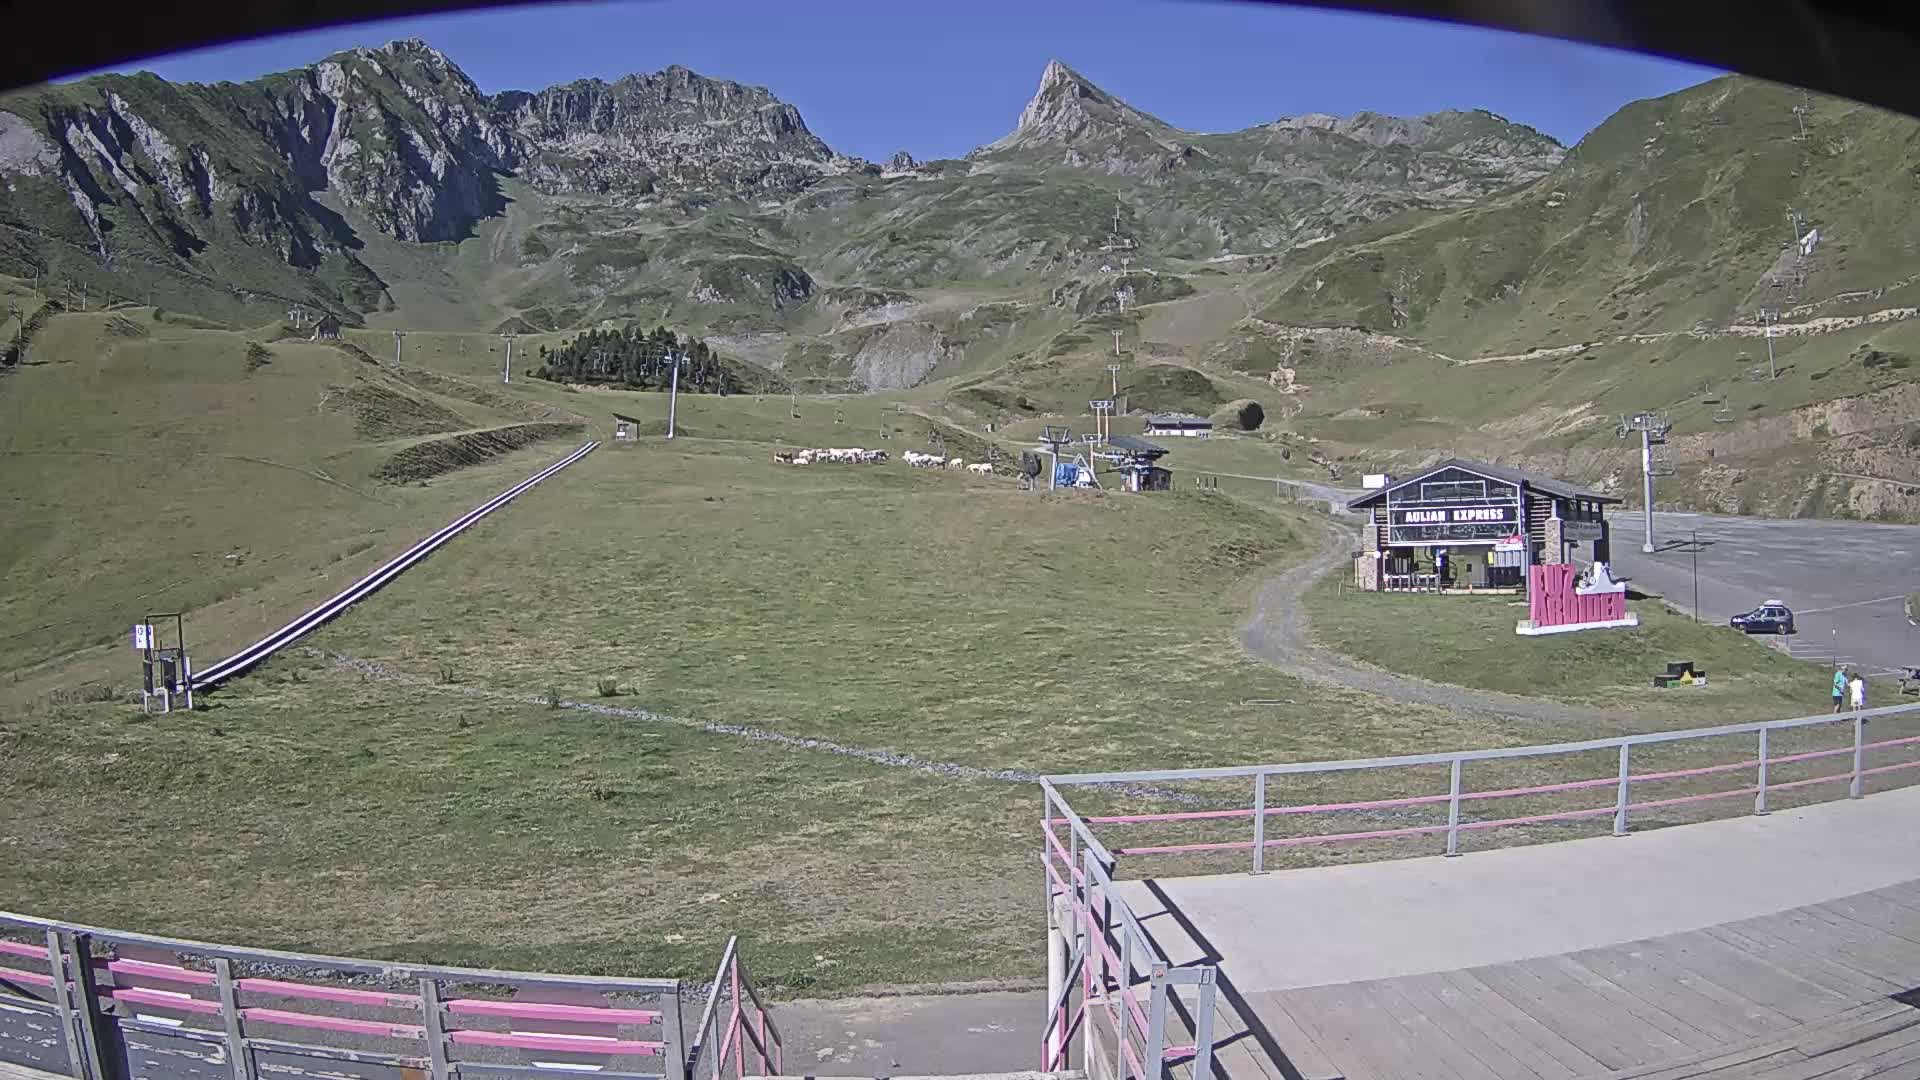 Webcam de Aulian - Front de neige